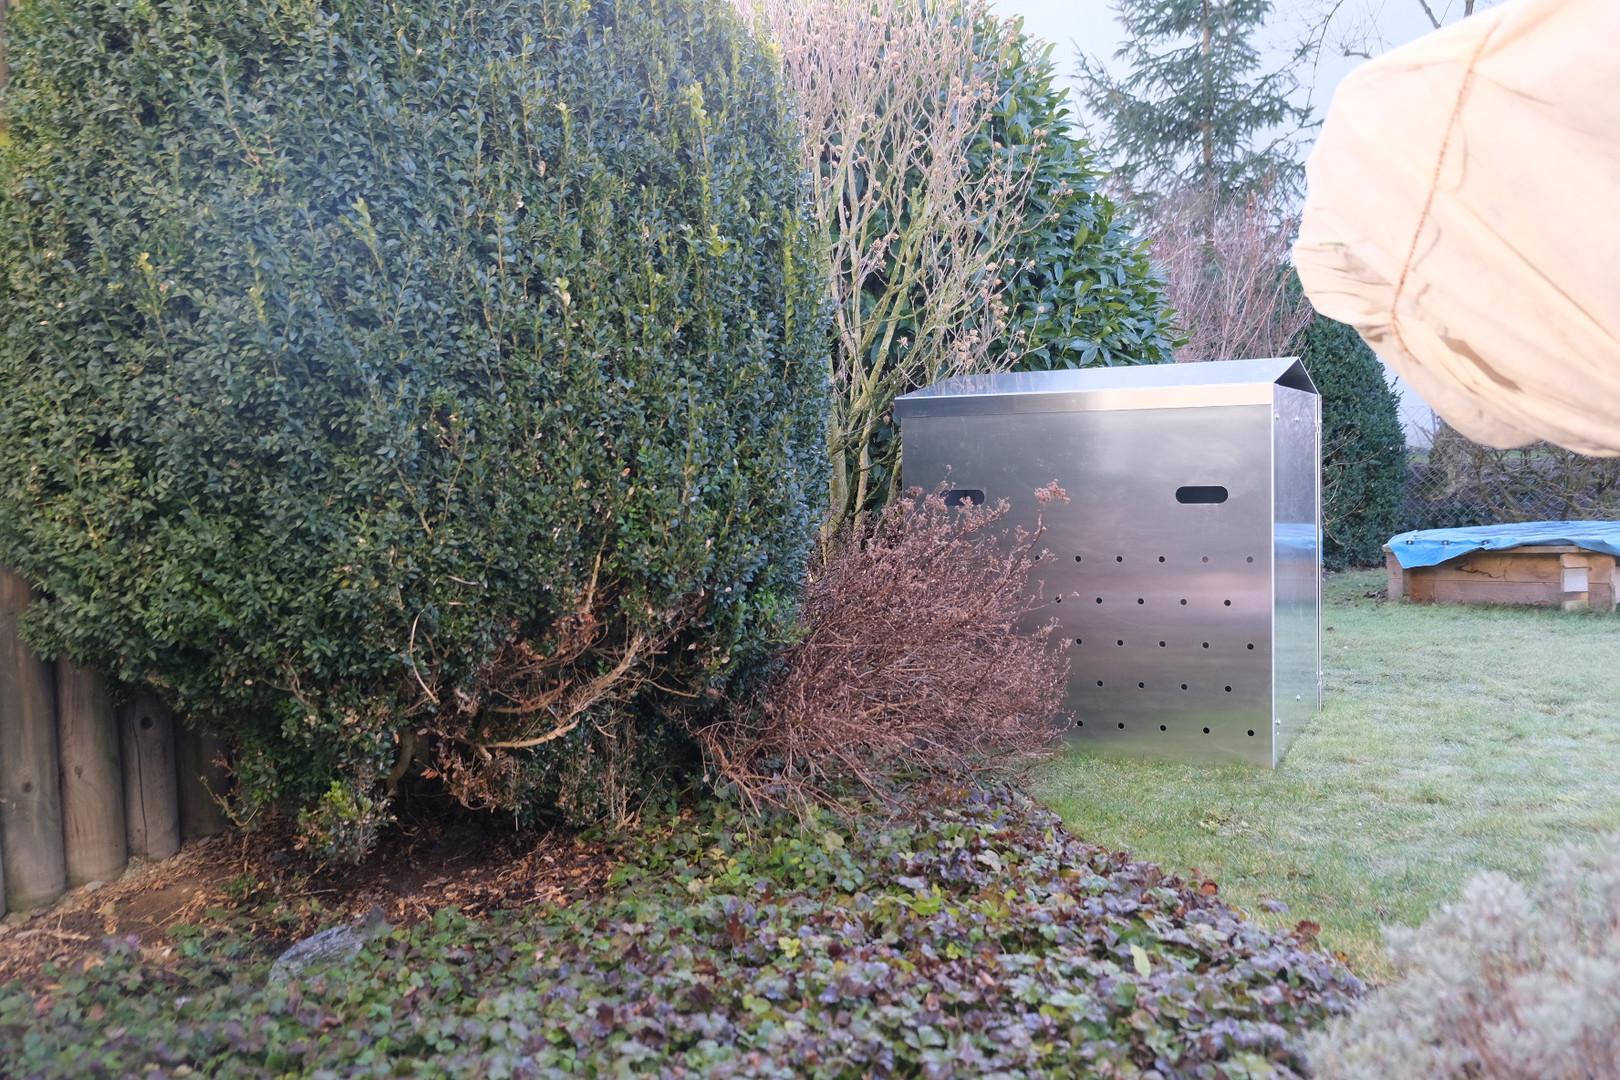 Cato_Mehrfamilienhaus_Detail2_Composting